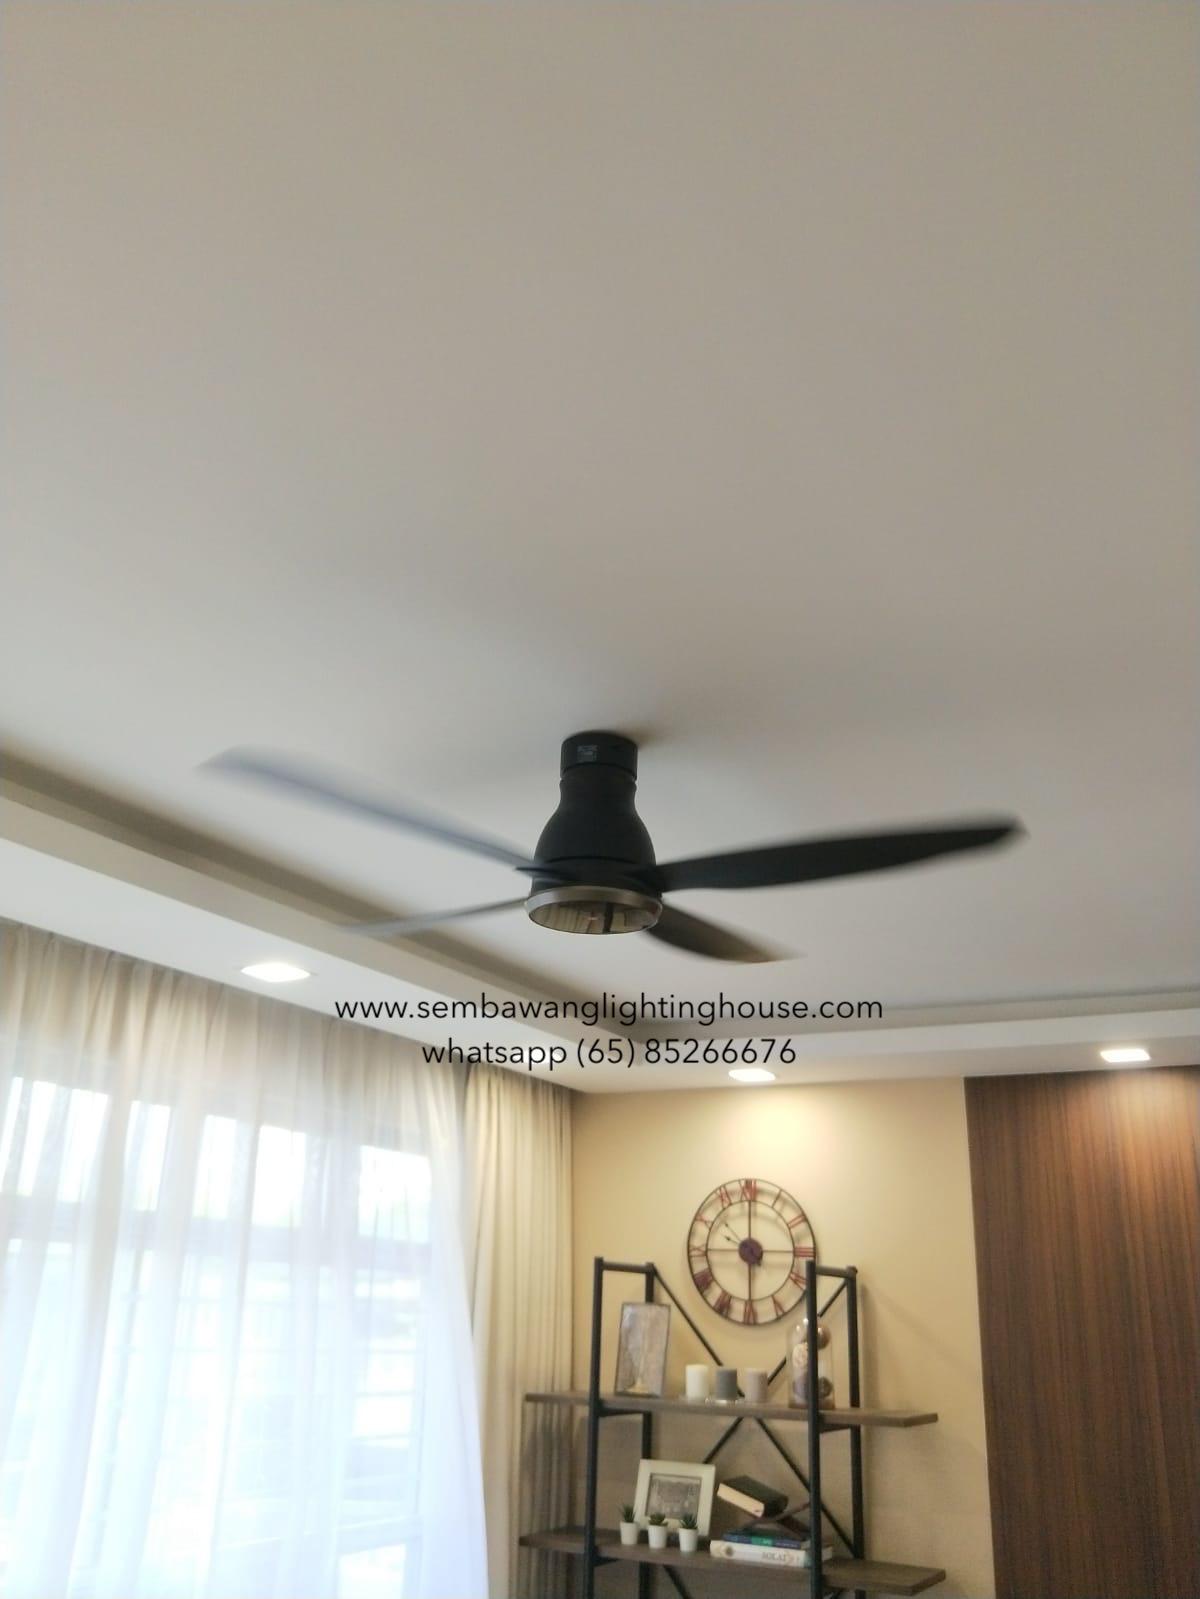 kdk-w56wv-black-ceiling-fan-sembawang-lighting-house-sample-09.jpg